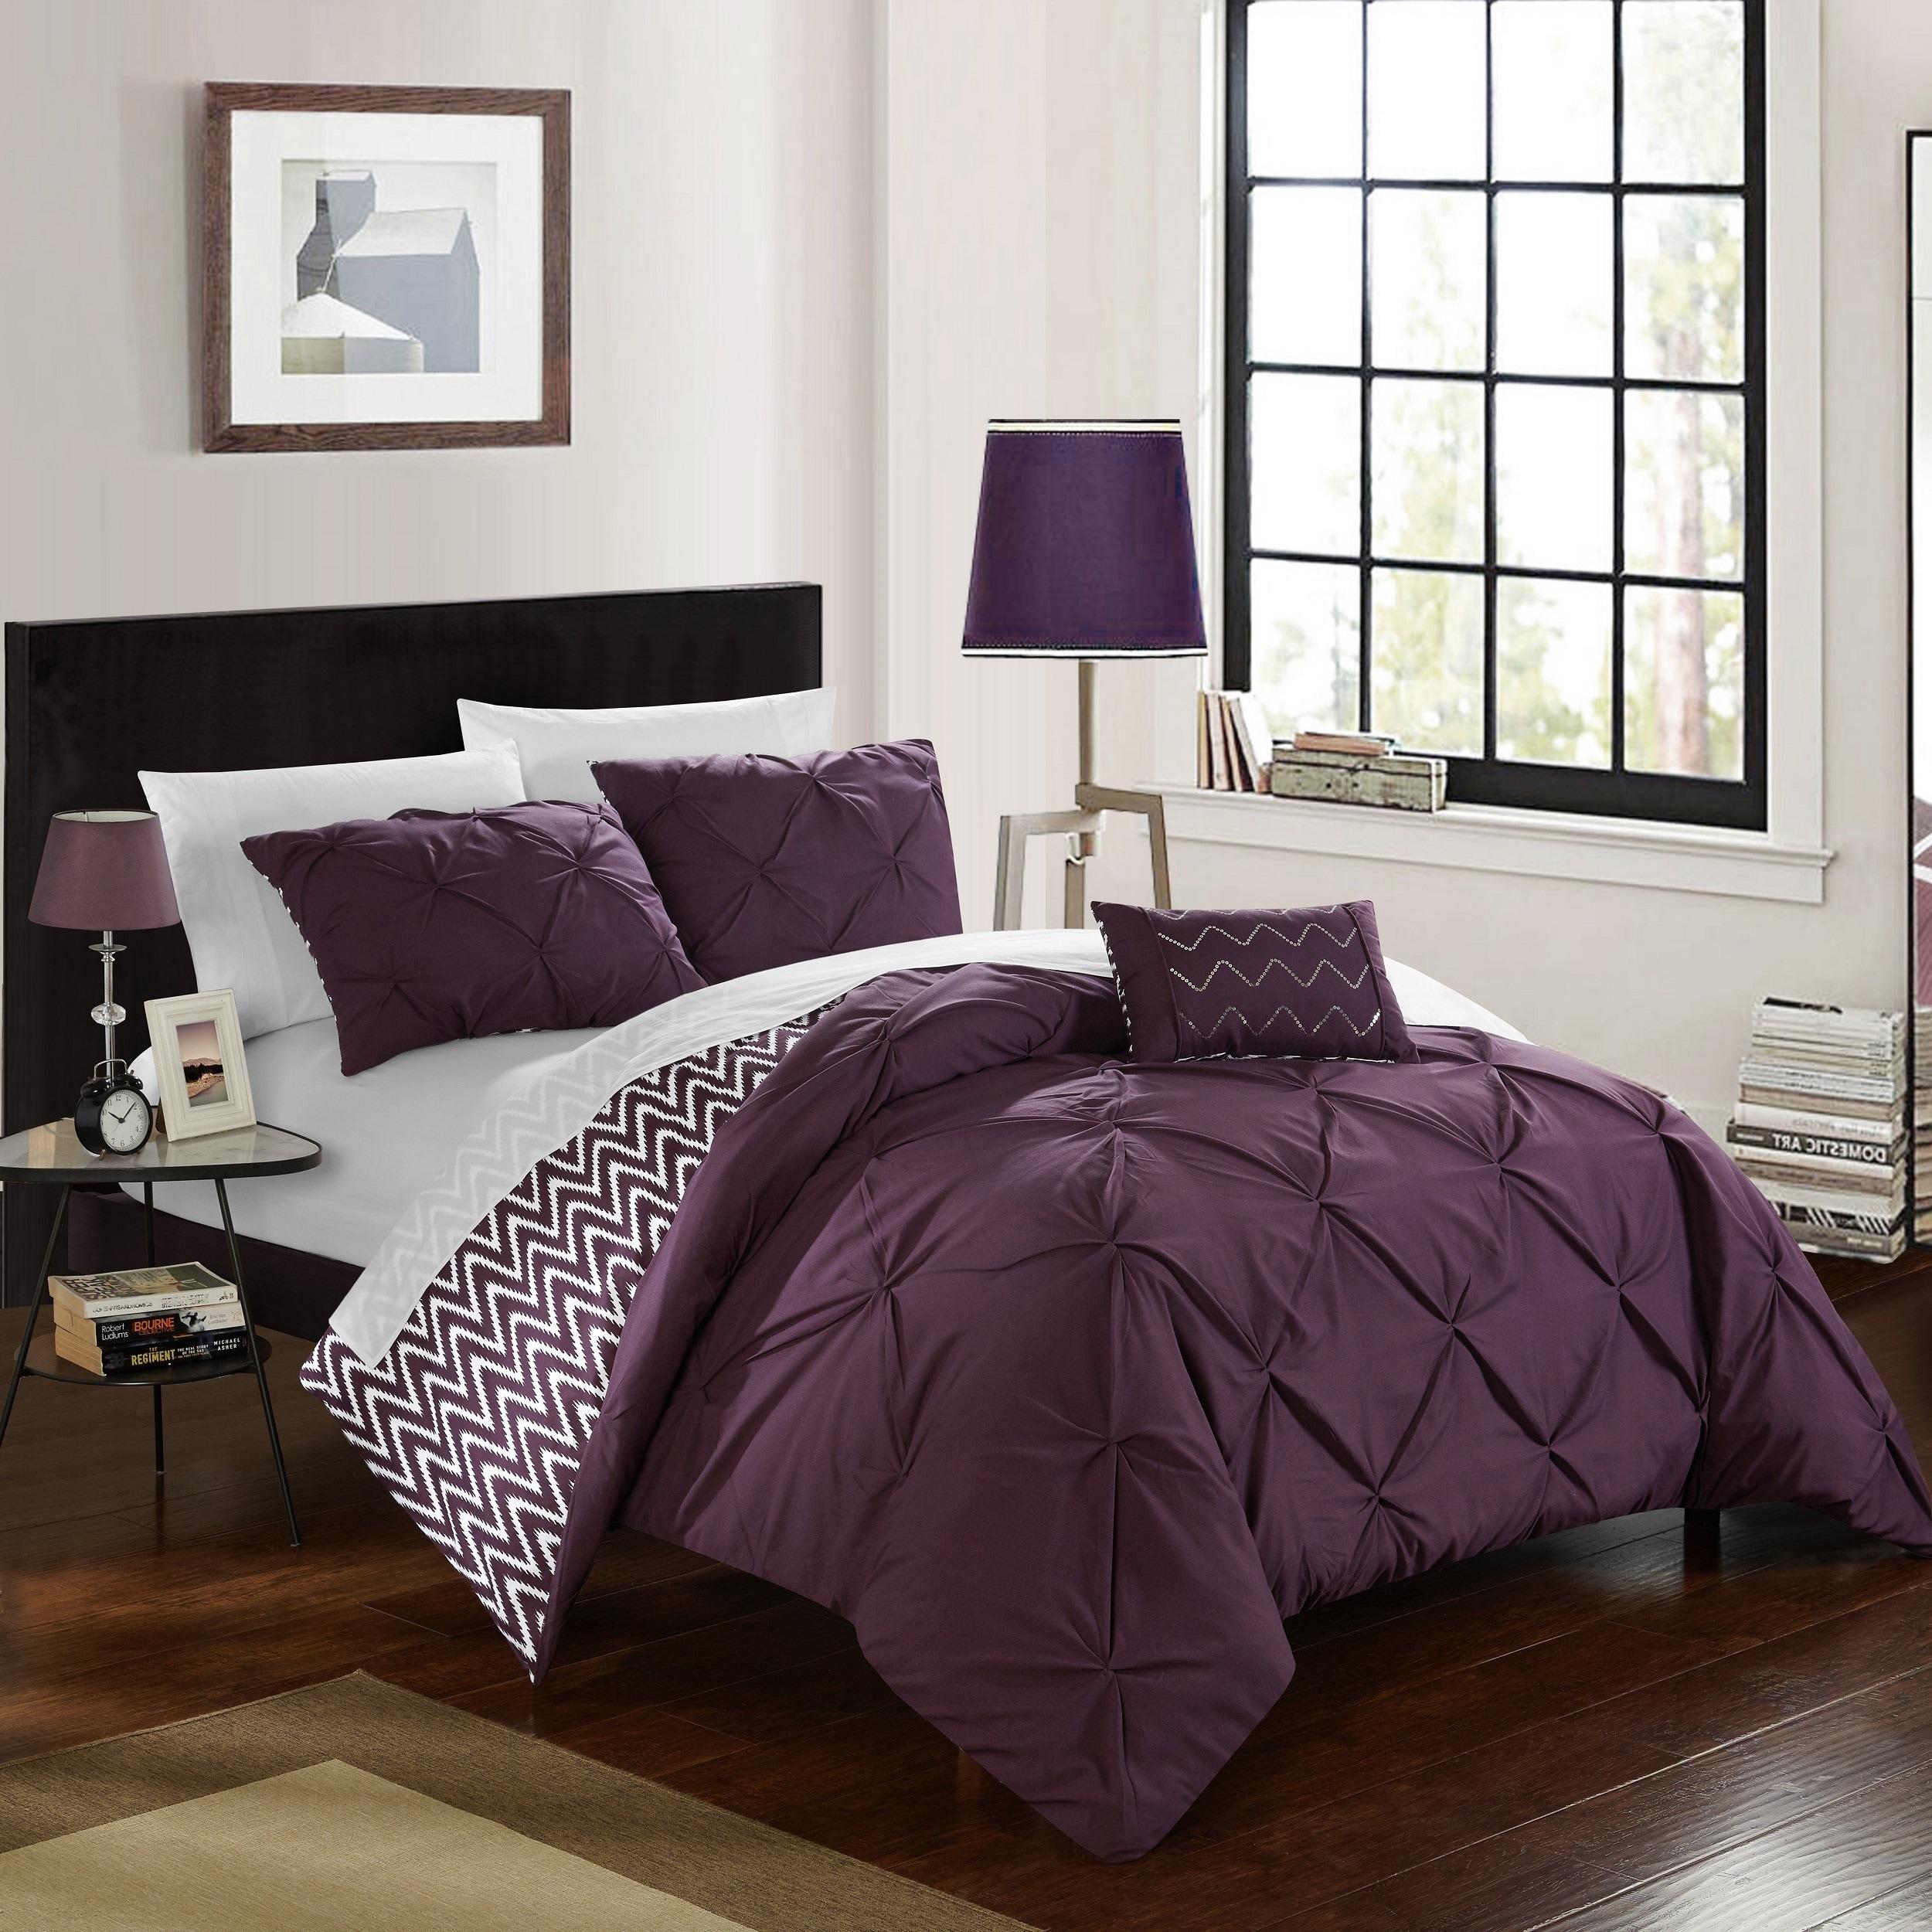 Shop Erin Purple Pintuck Chevron Microfiber 8 Piece Bed In A Bag